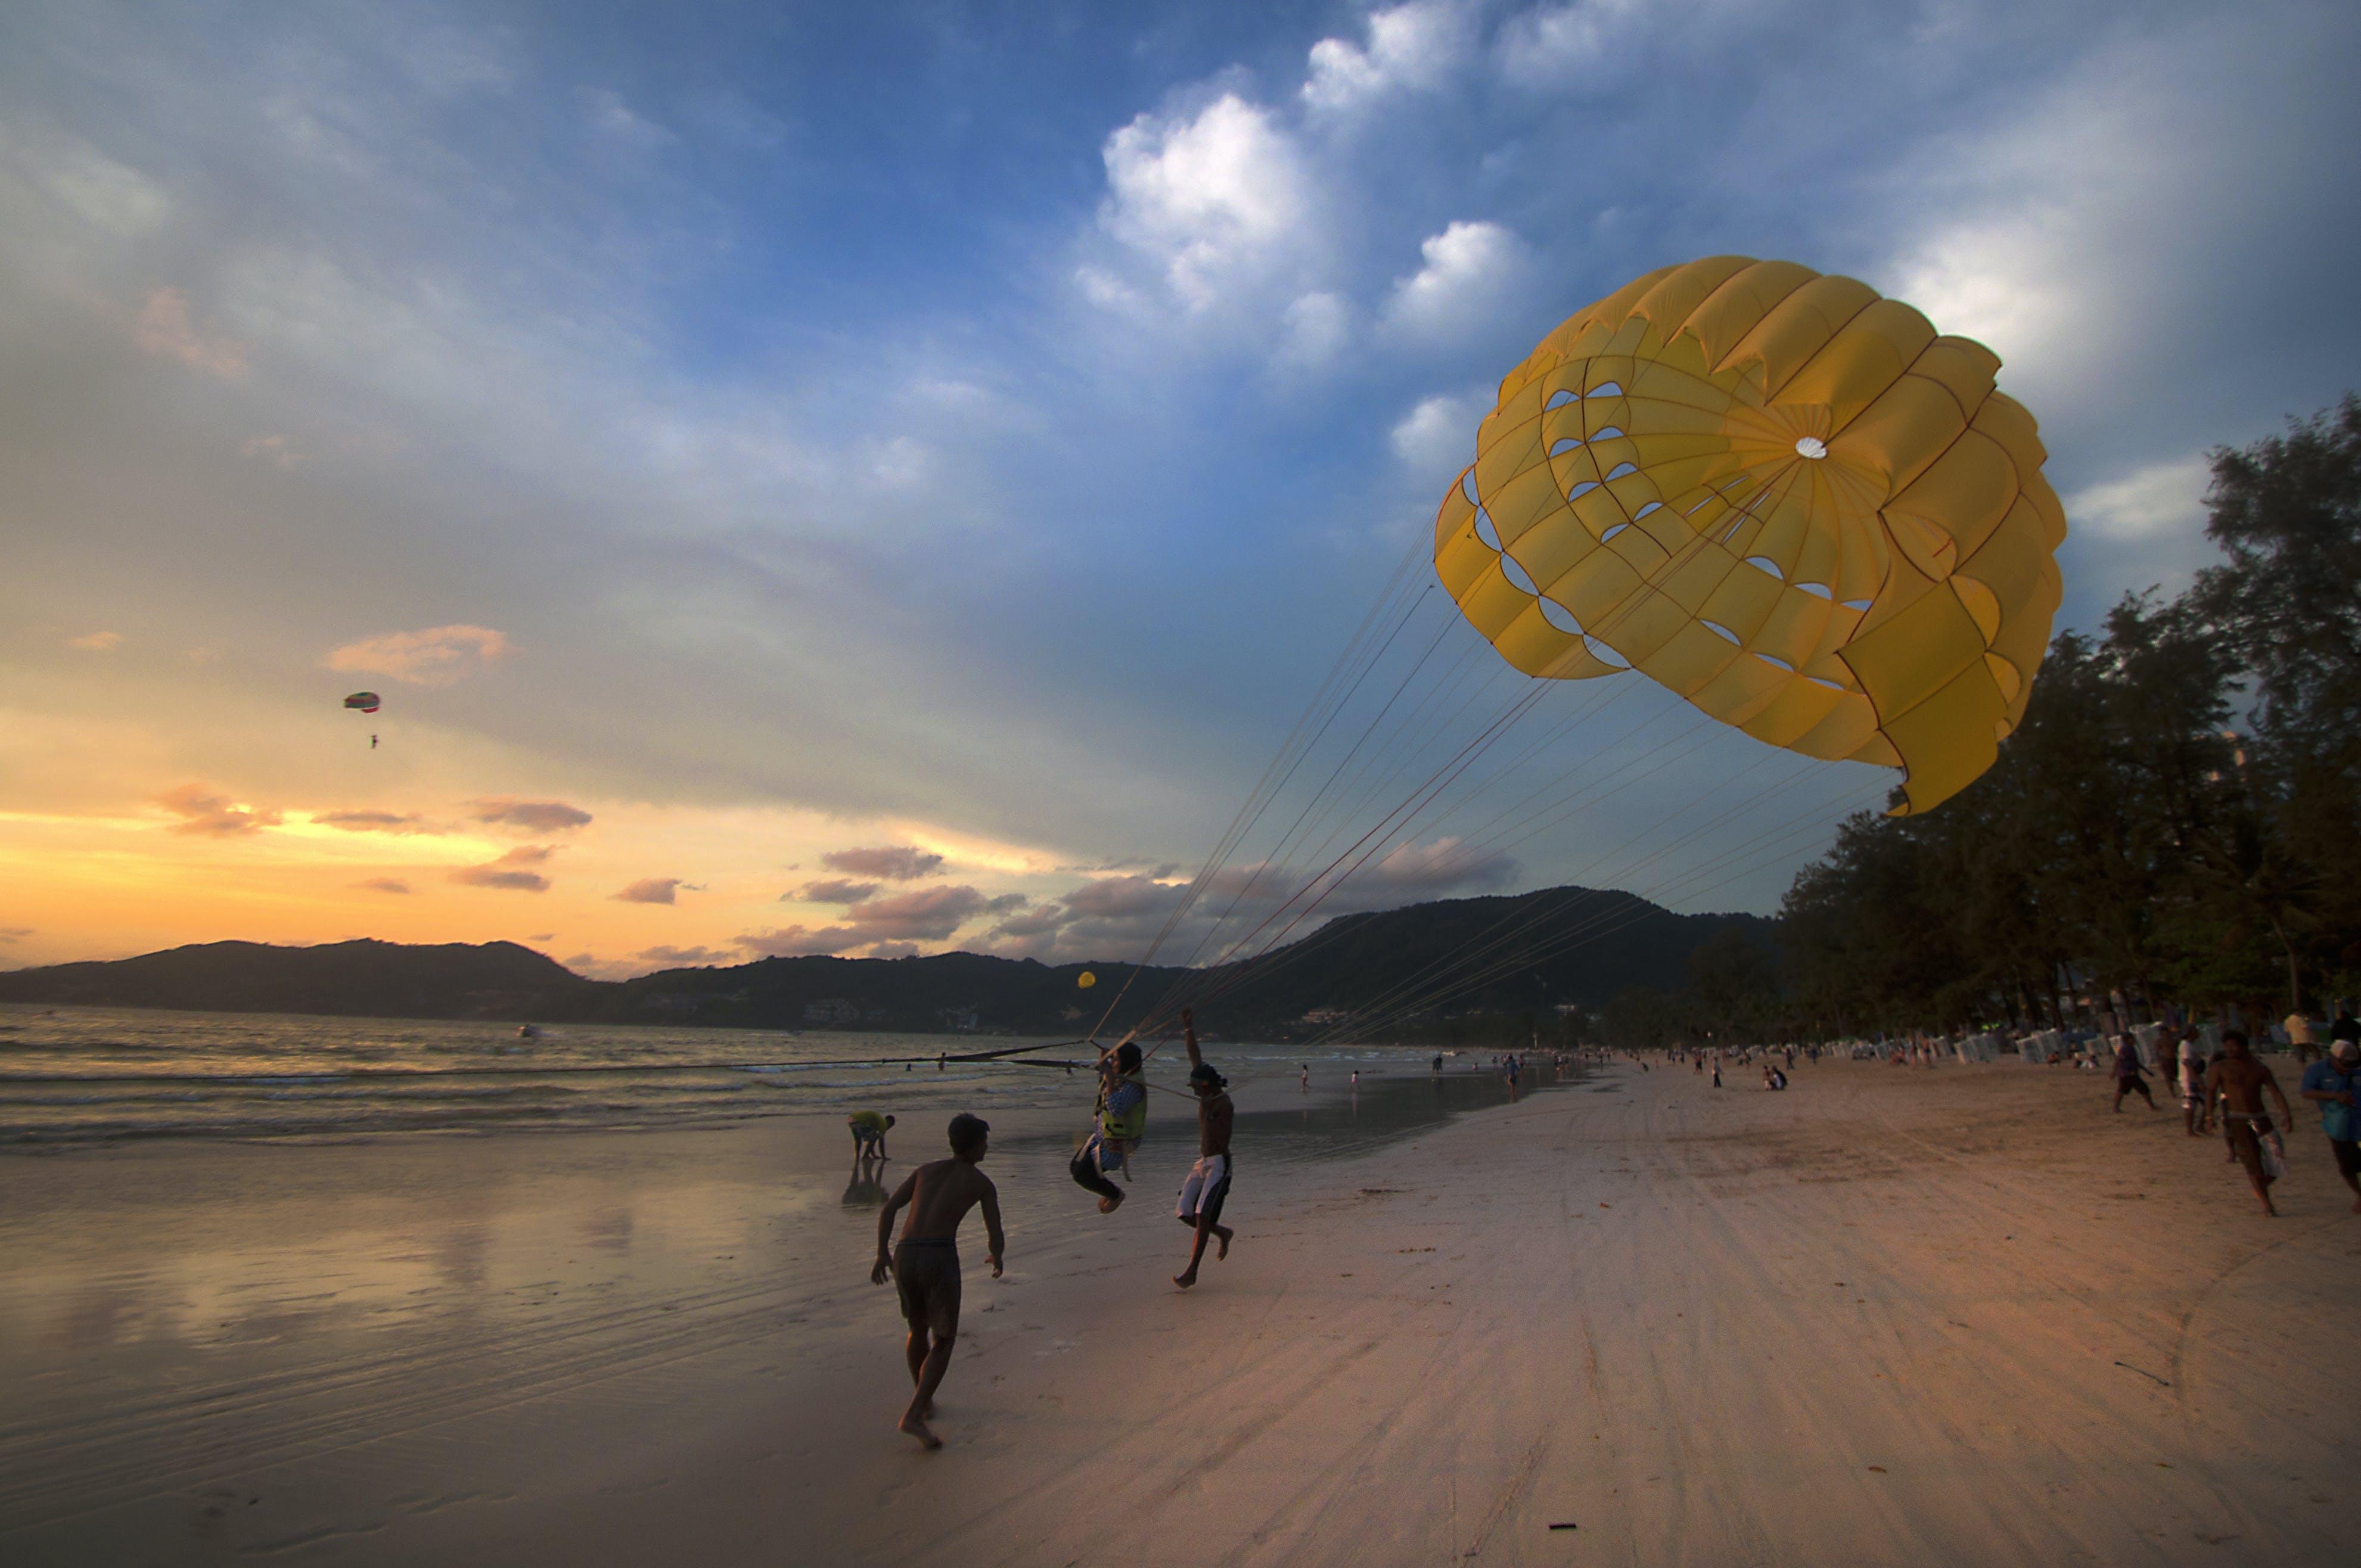 Free stock photo of beach, para sailing, parachute, parasail